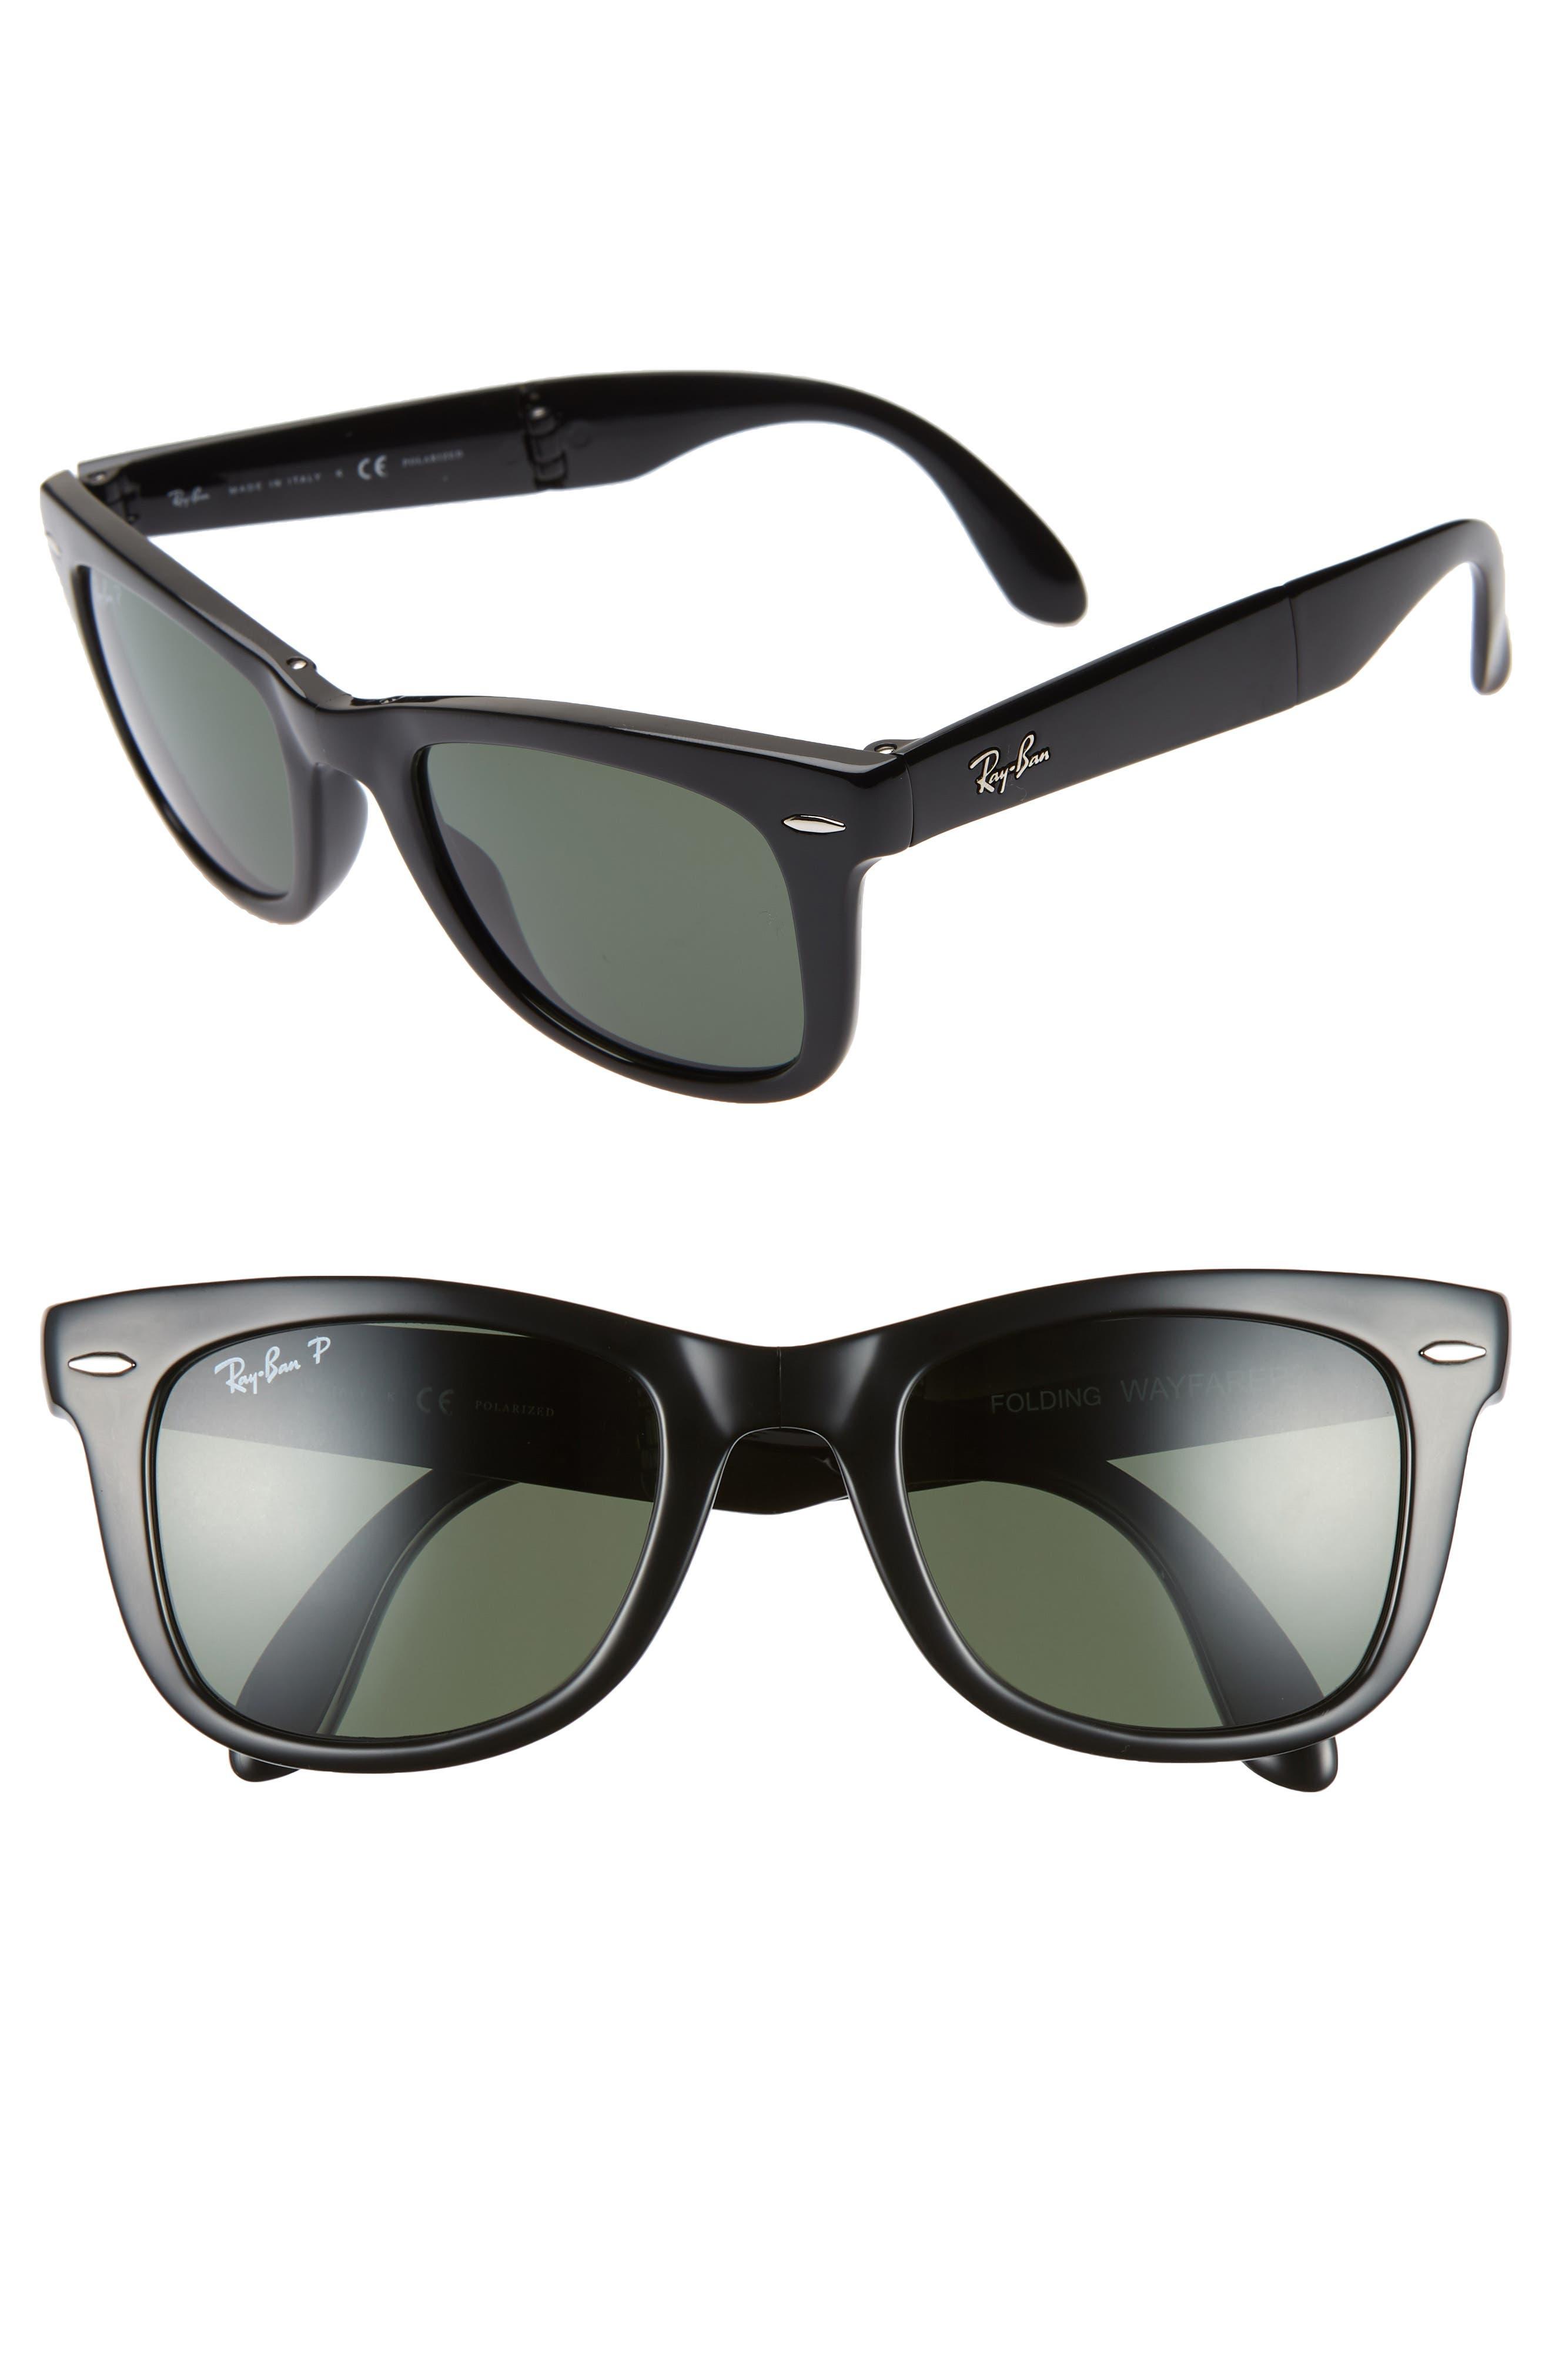 Ray-Ban 50Mm Wayfarer Polarized Folding Sunglasses - Black/ Green Solid